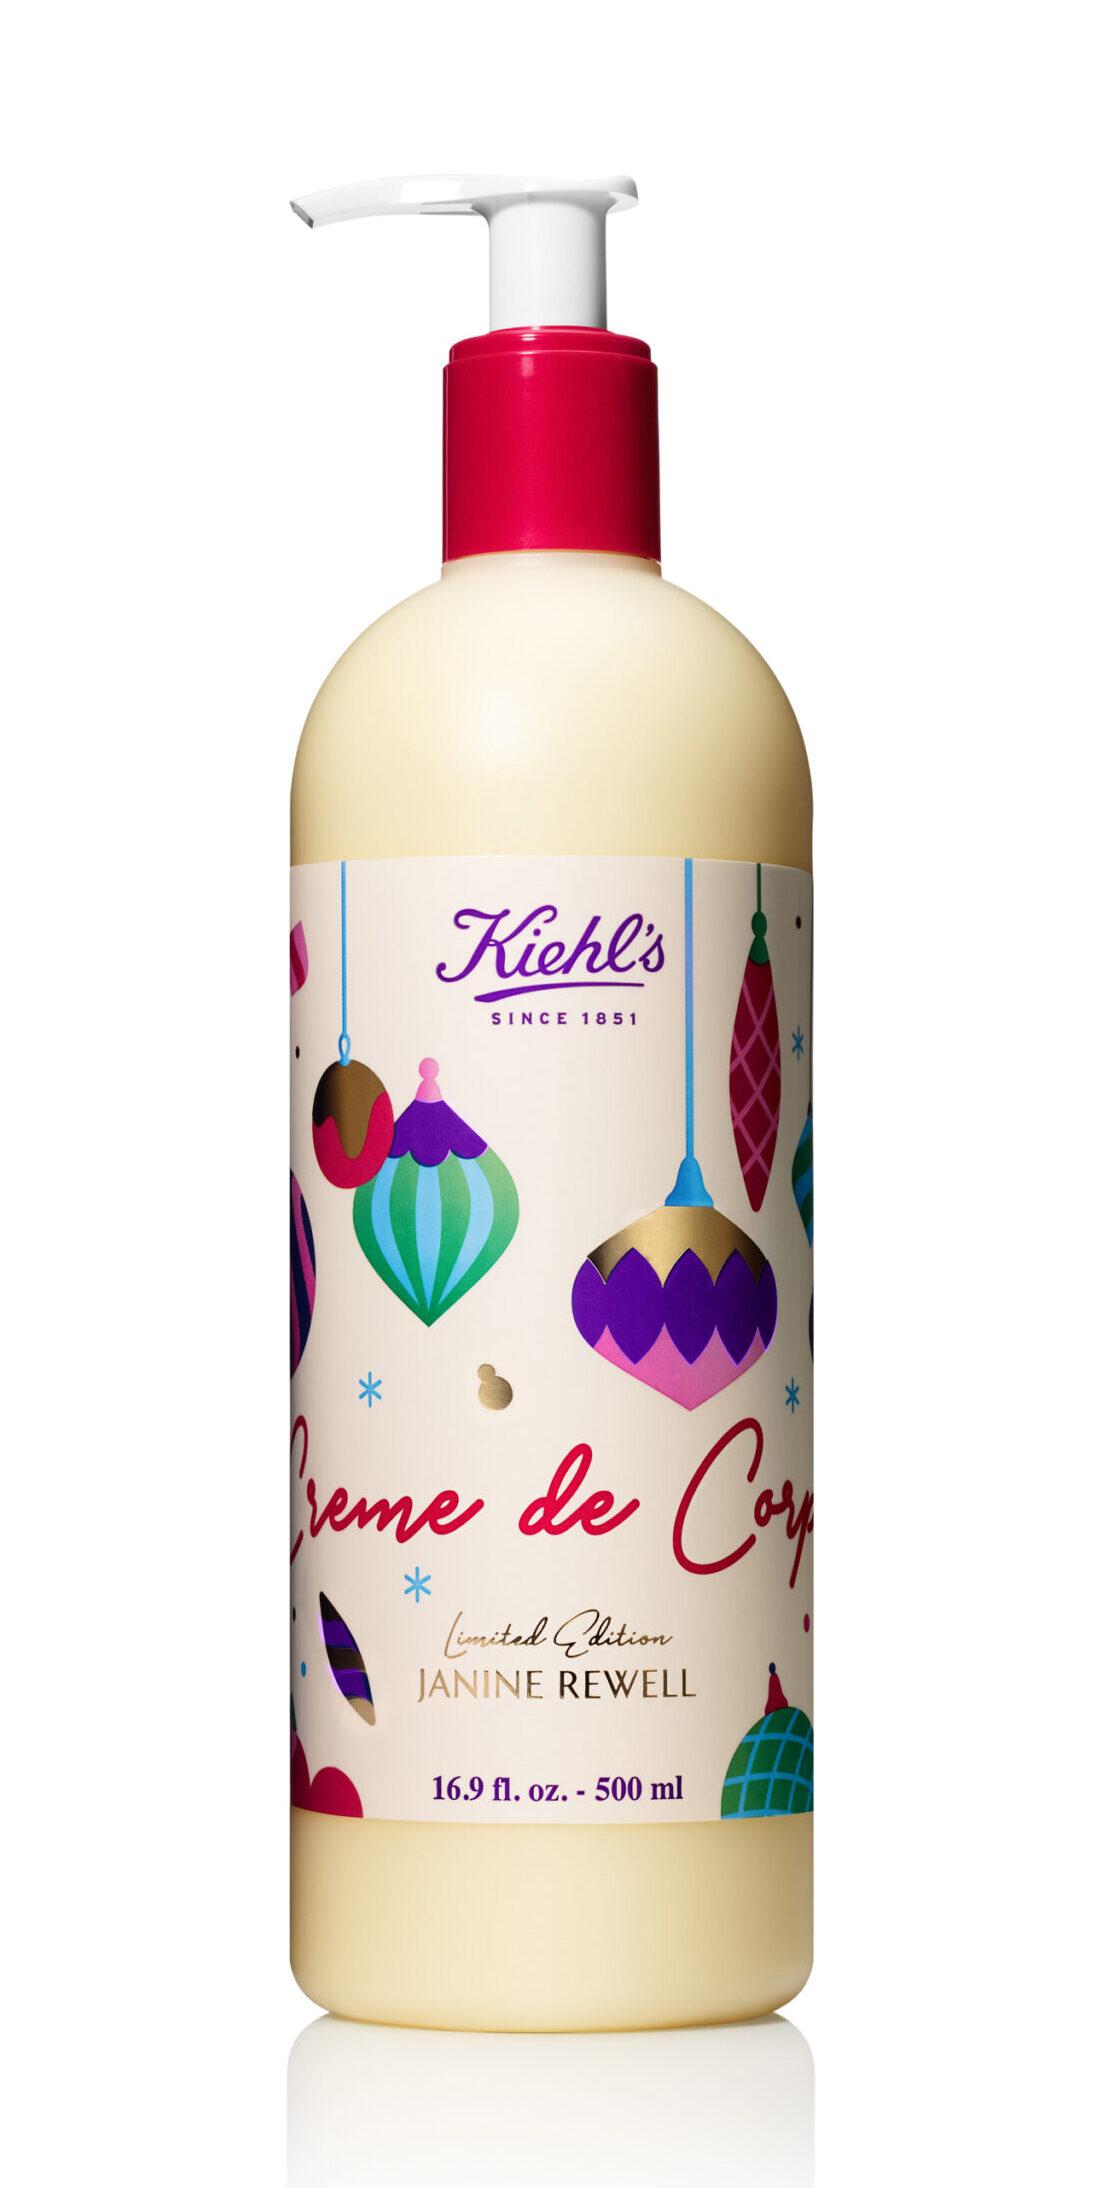 Kiehl's bestsellere, Kiehl's, ansigtscreme, serum, bodylotion, kropscreme,